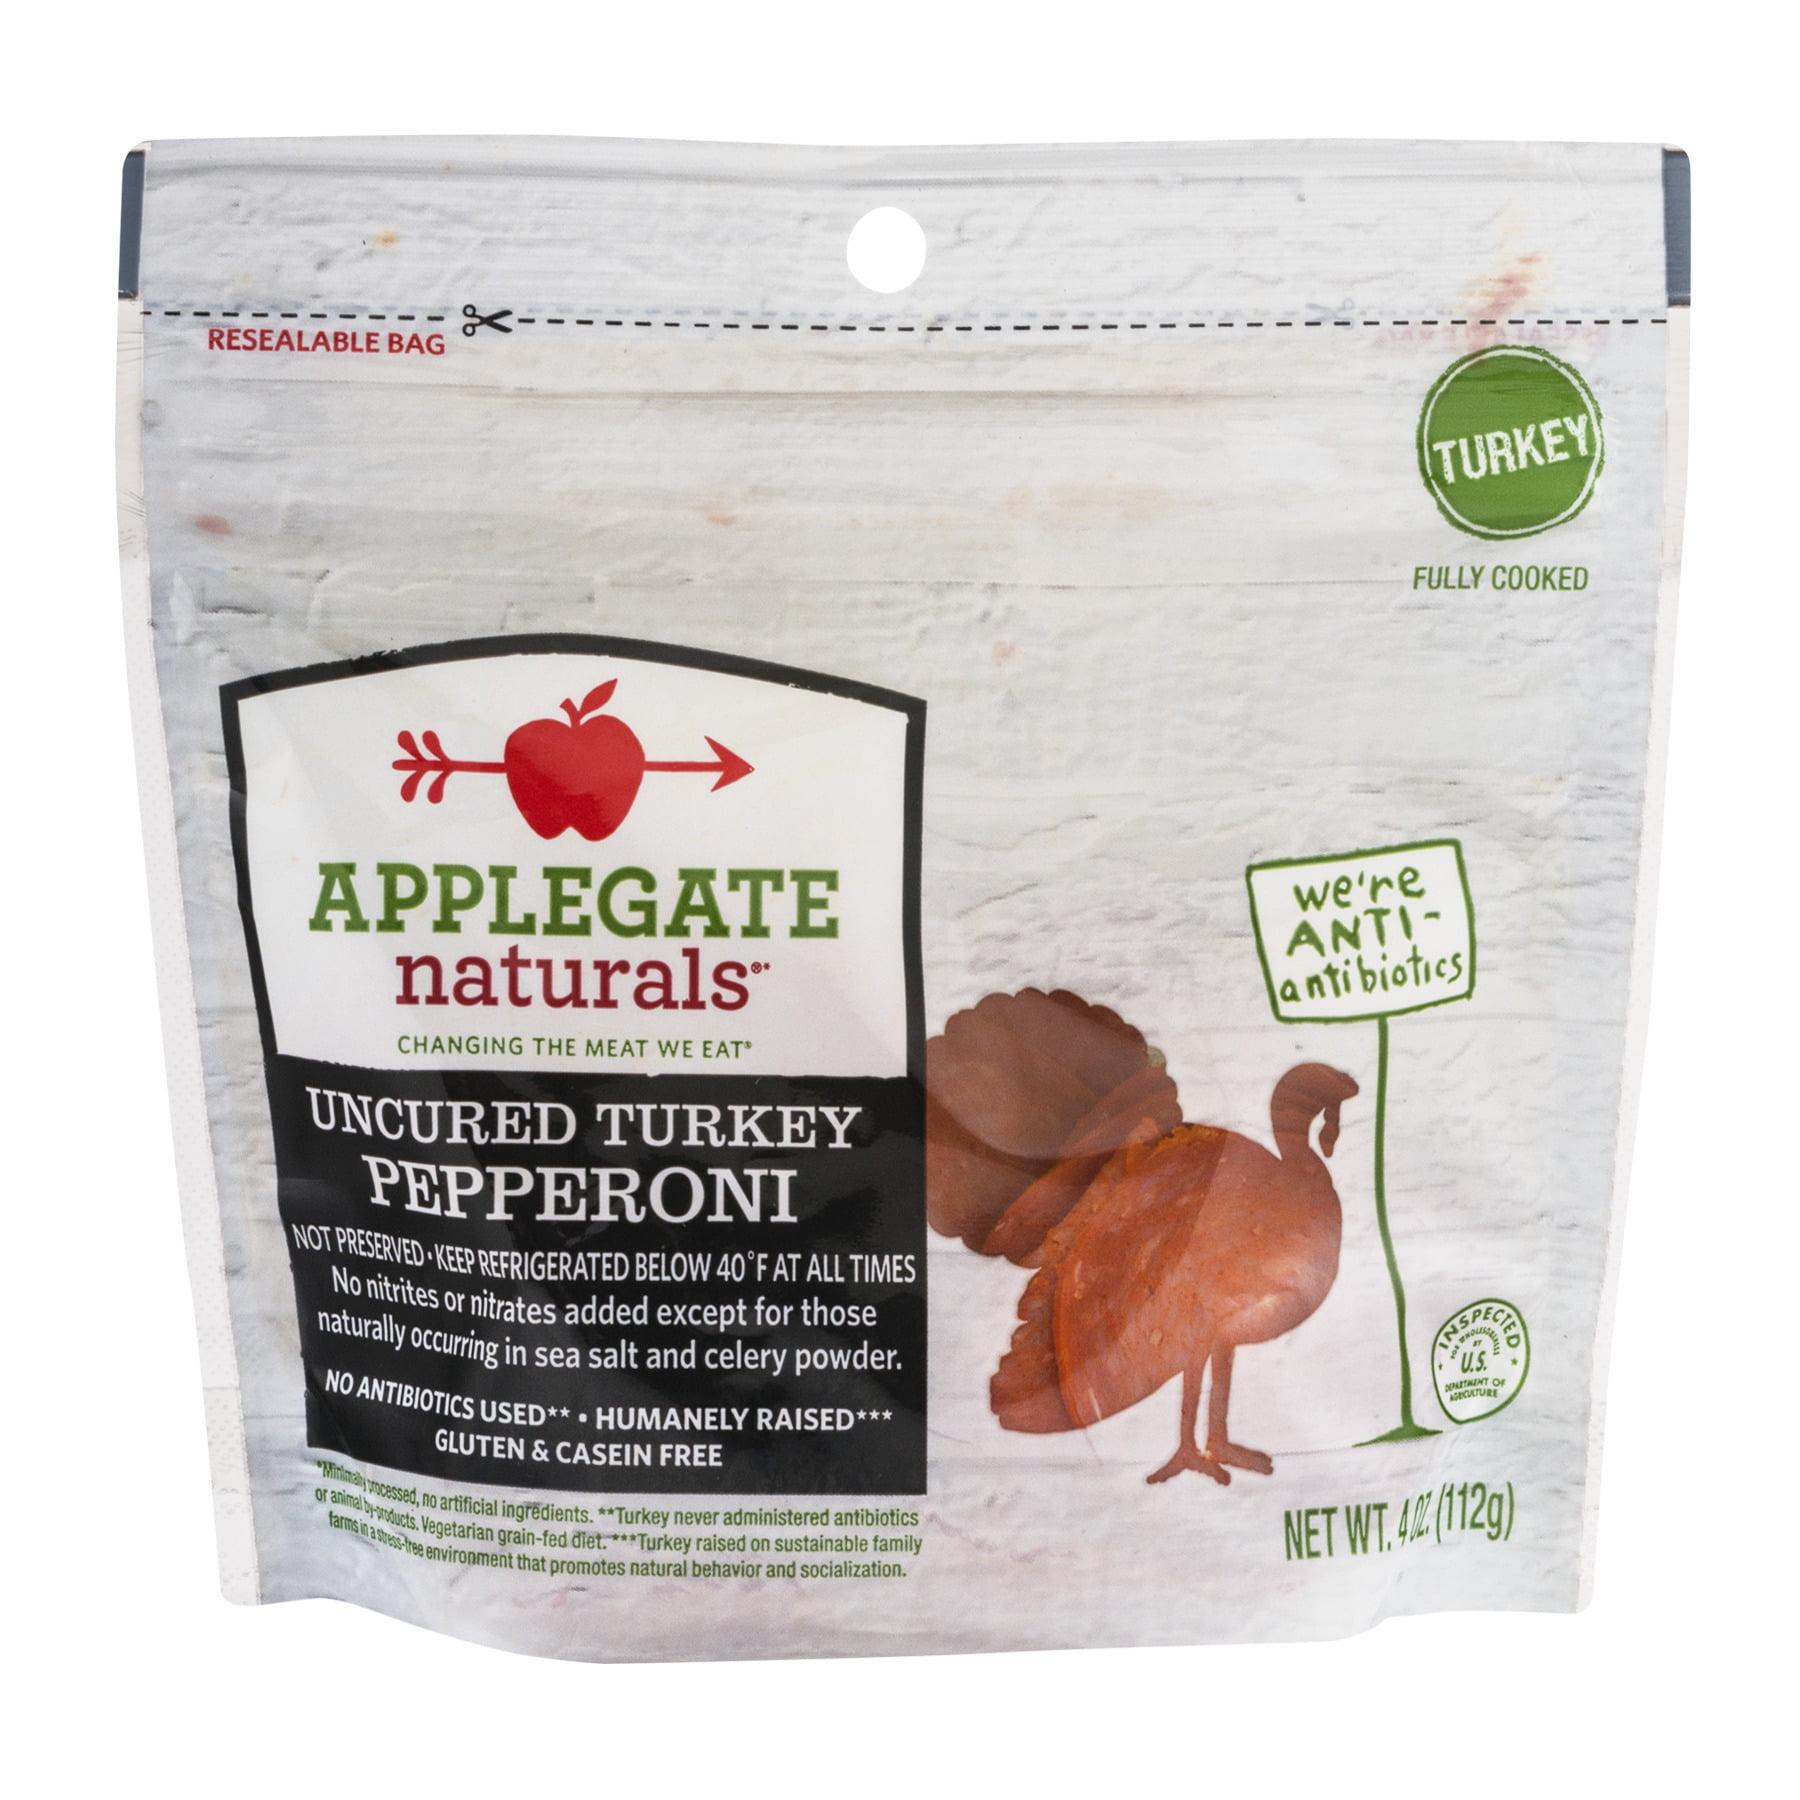 Applegate, Natural Uncured Turkey Pepperoni, 4oz, 4.0 OZ